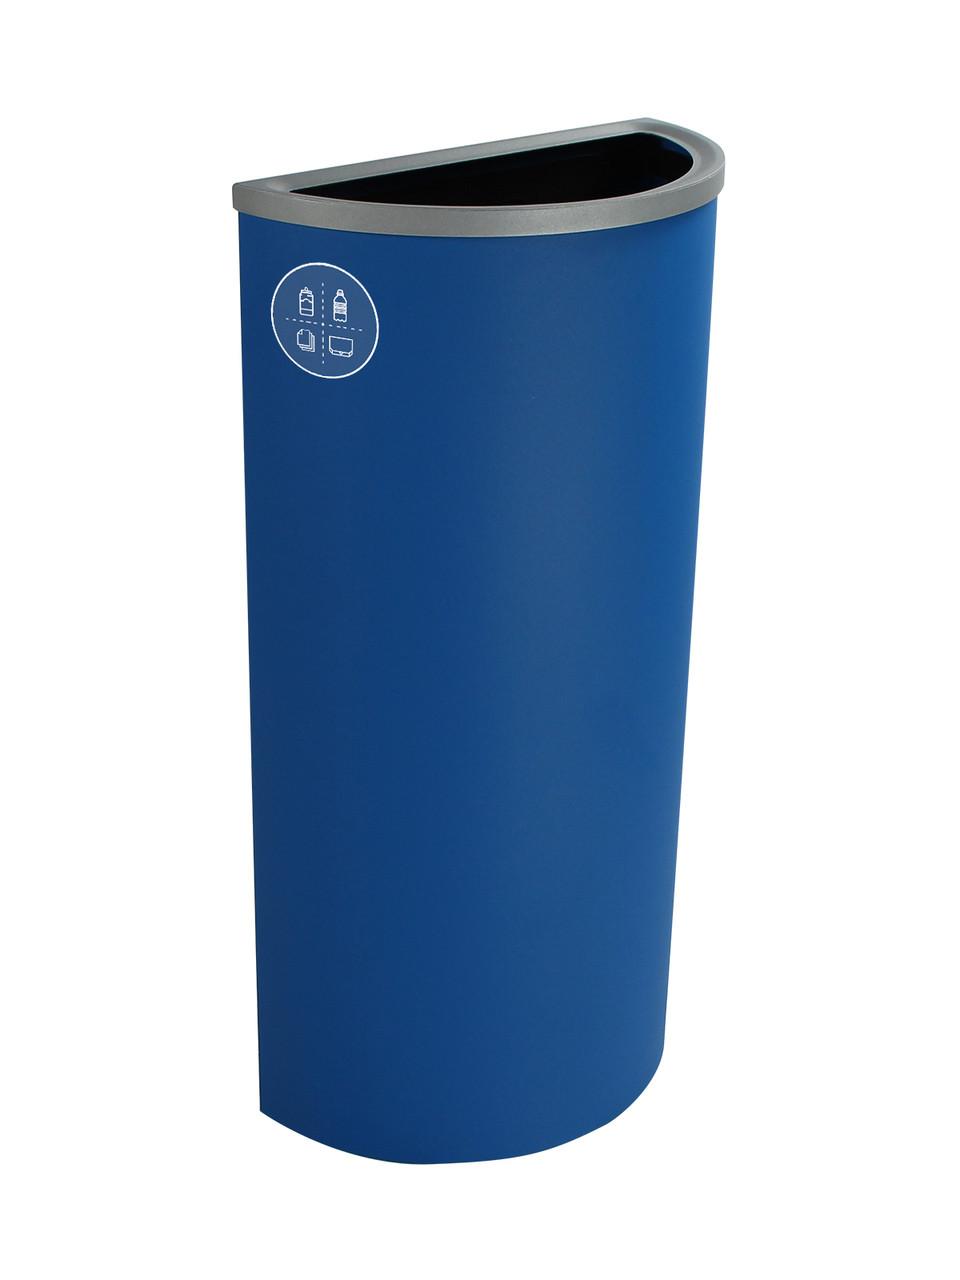 8 Gallon Steel Spectrum Half Round Multi Recycle Bin Blue 8107023-4